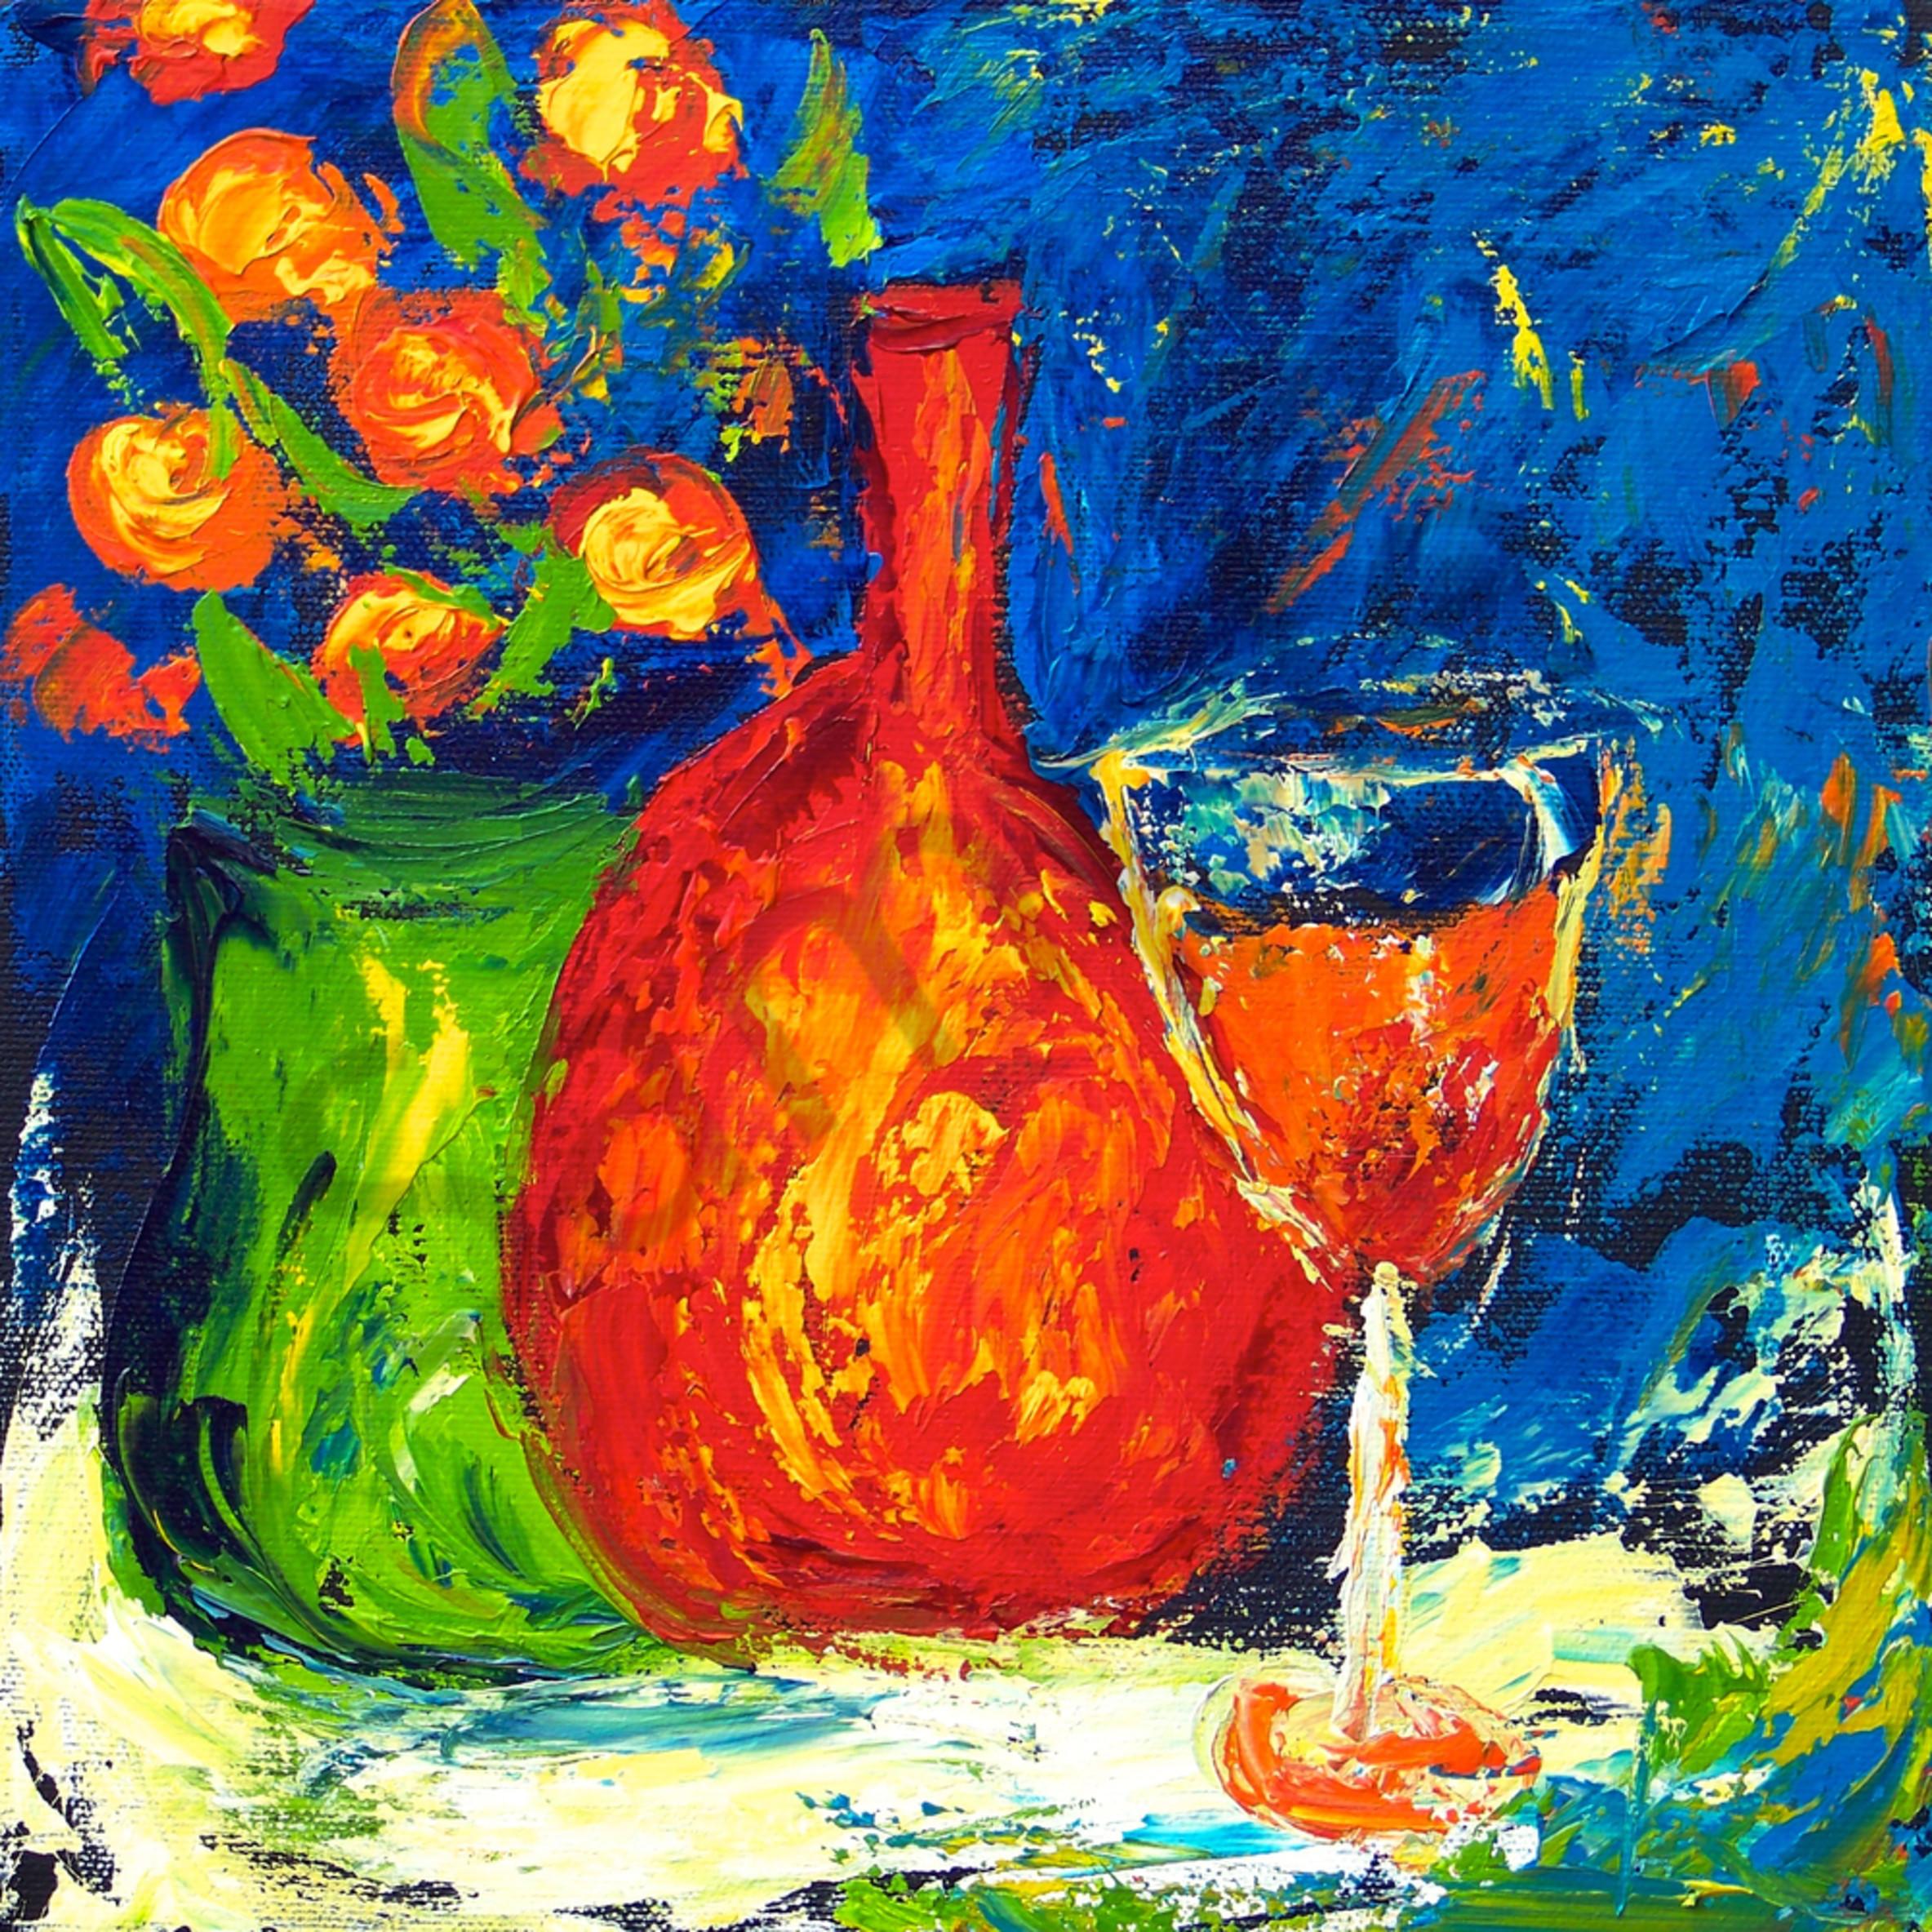 Red wine flowers   hi rz t1klcp